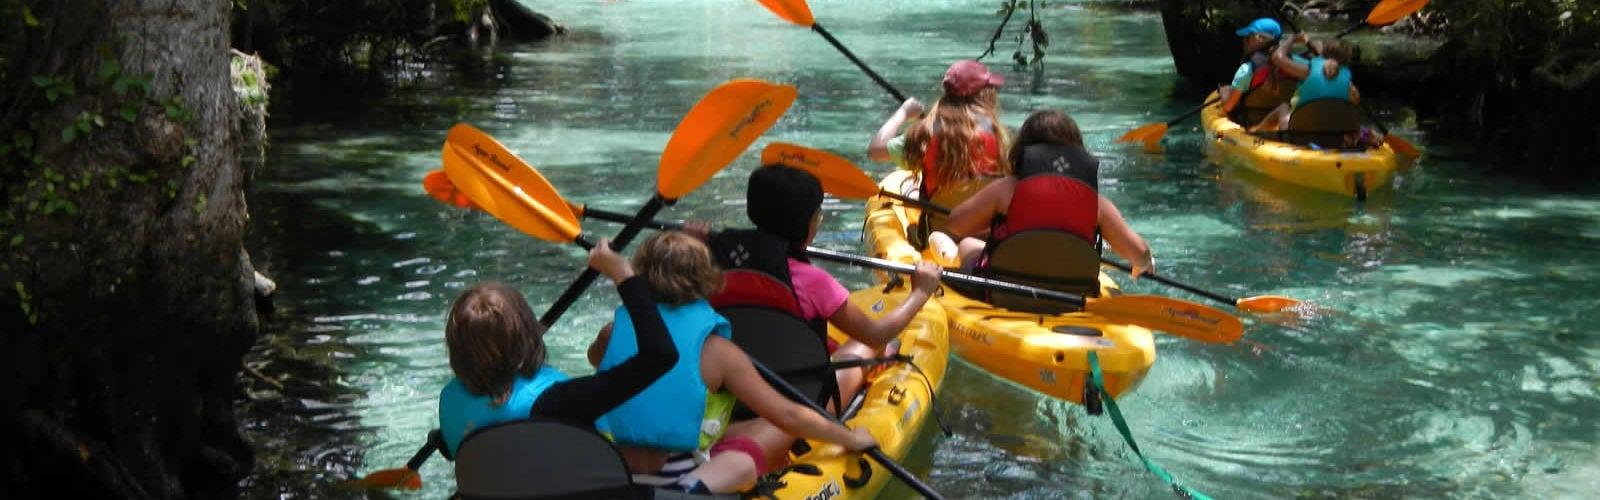 eco-adventures-tours-kayak-rivieres-une